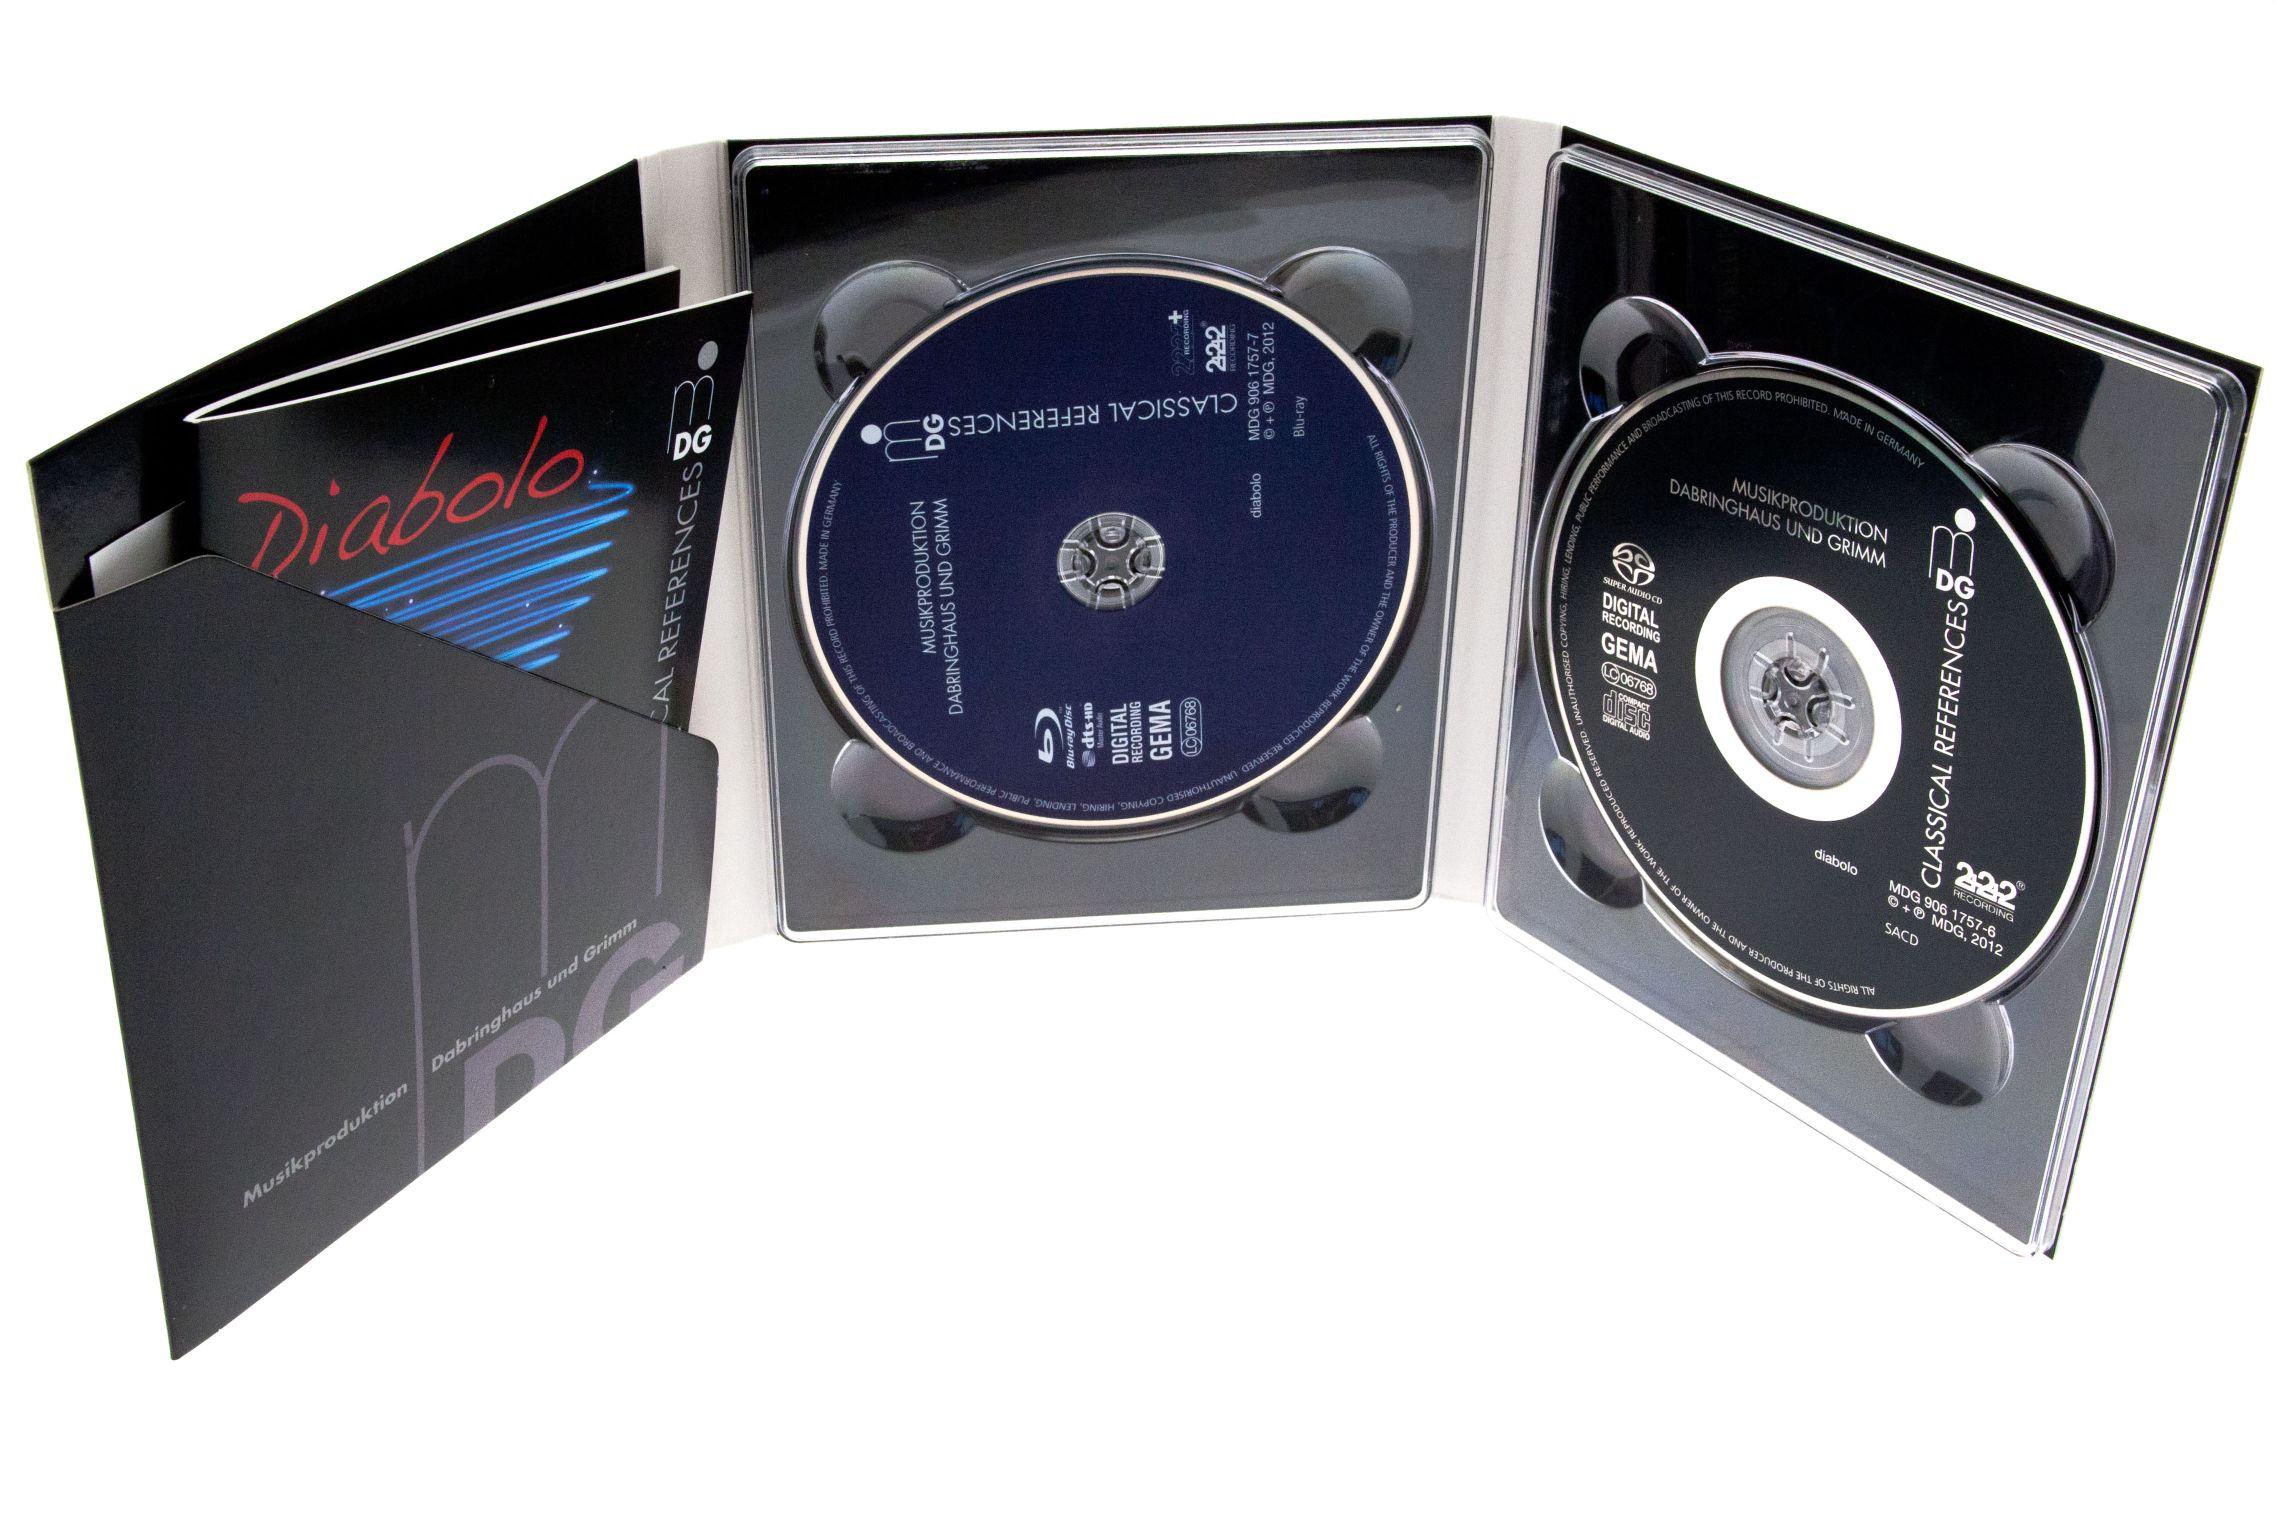 BD Pure Audio: Blu-ray-Alternative zur Super Audio CD - Blu-ray Pure Audio und Super Audio CD in einer Packung. (Foto: Nina Sebayang/Golem.de)